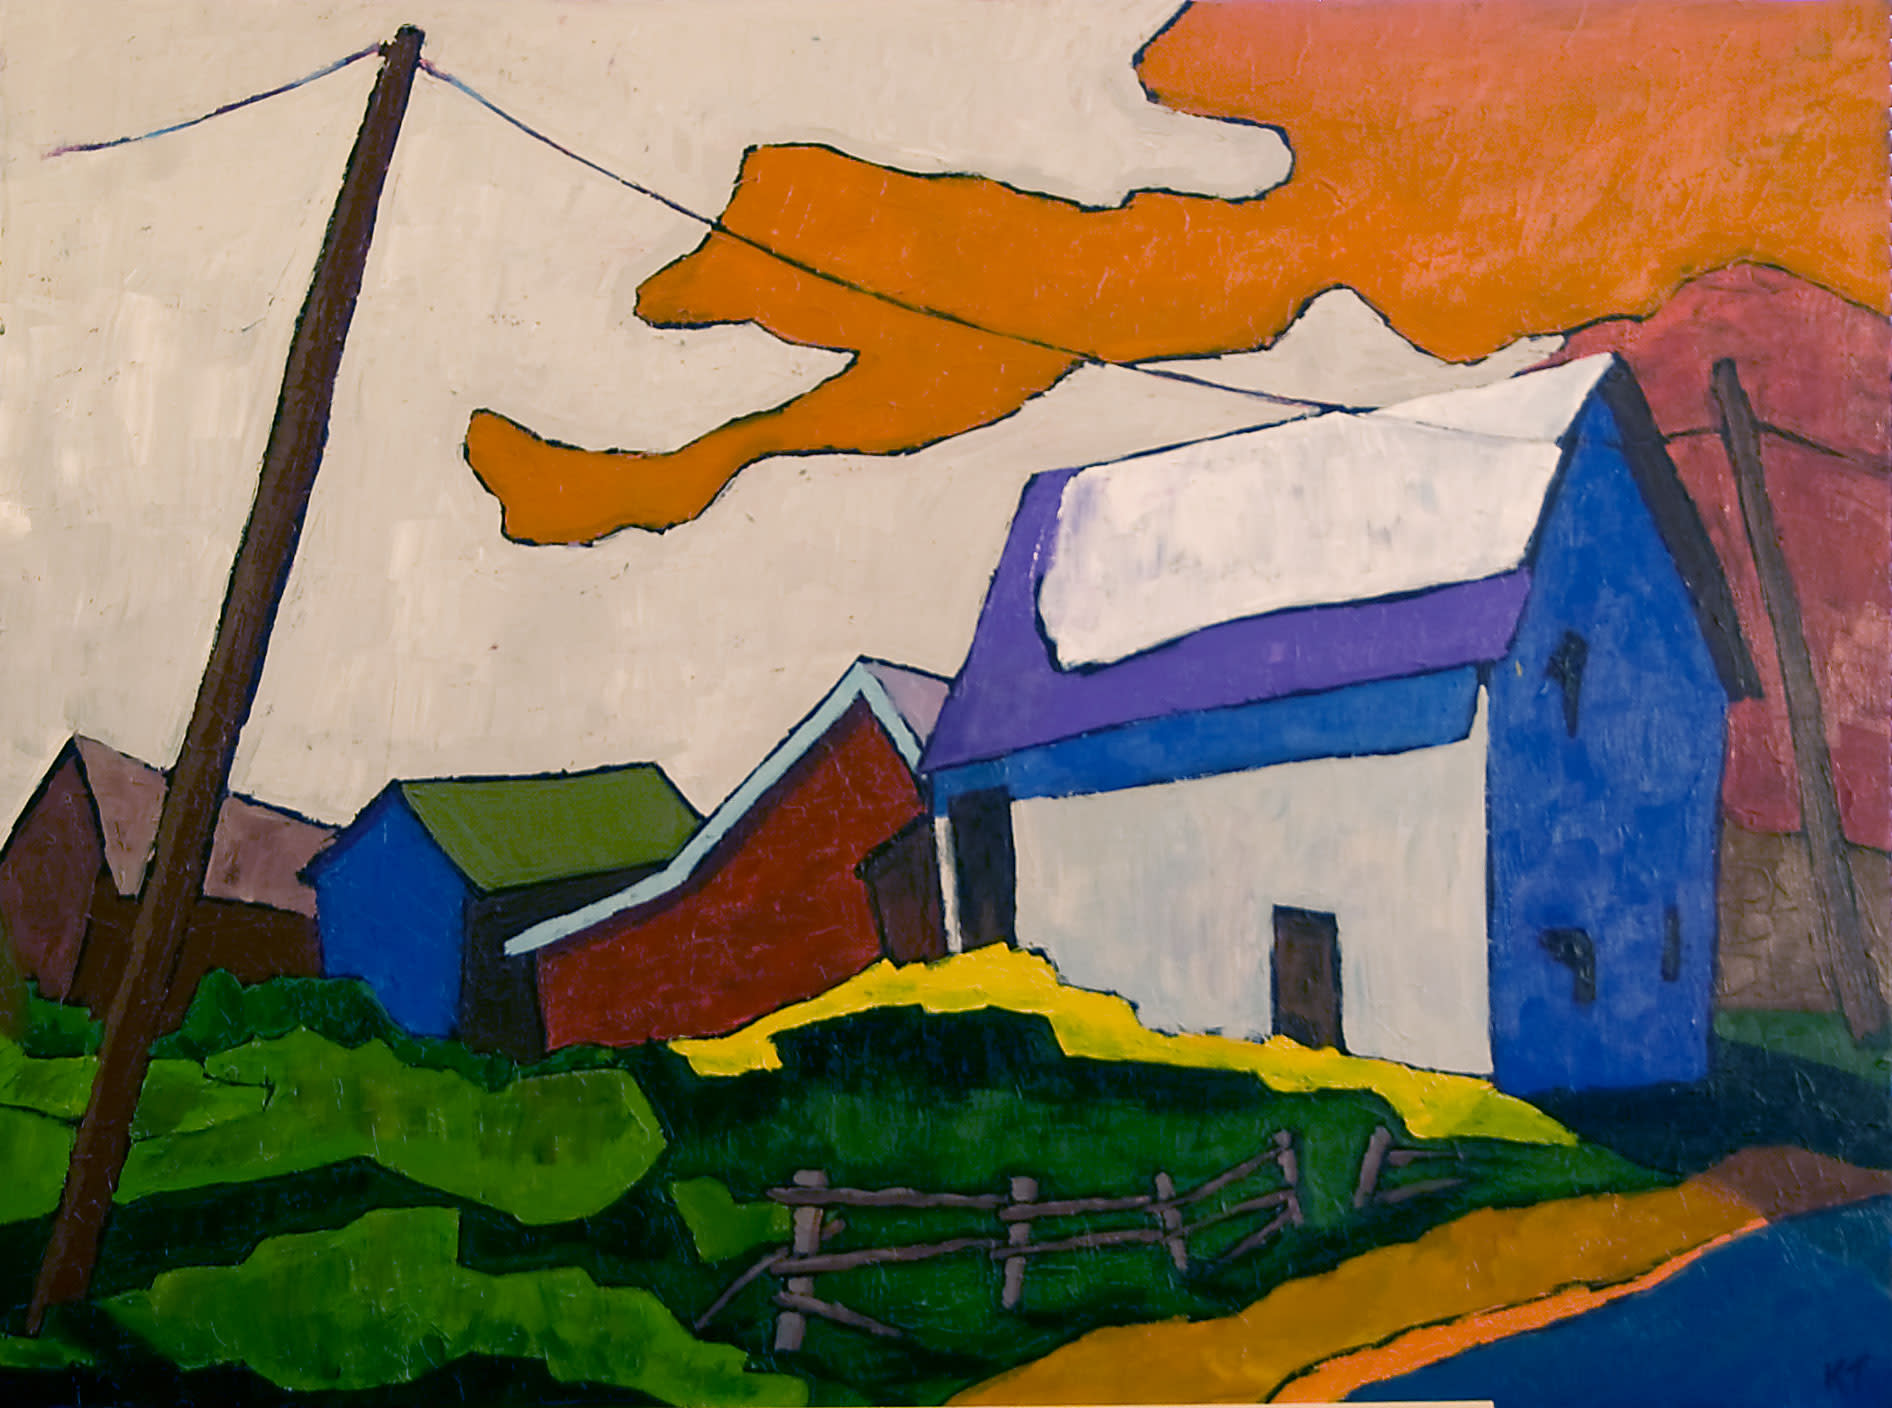 Rural idyl dsc9990 rbzqym